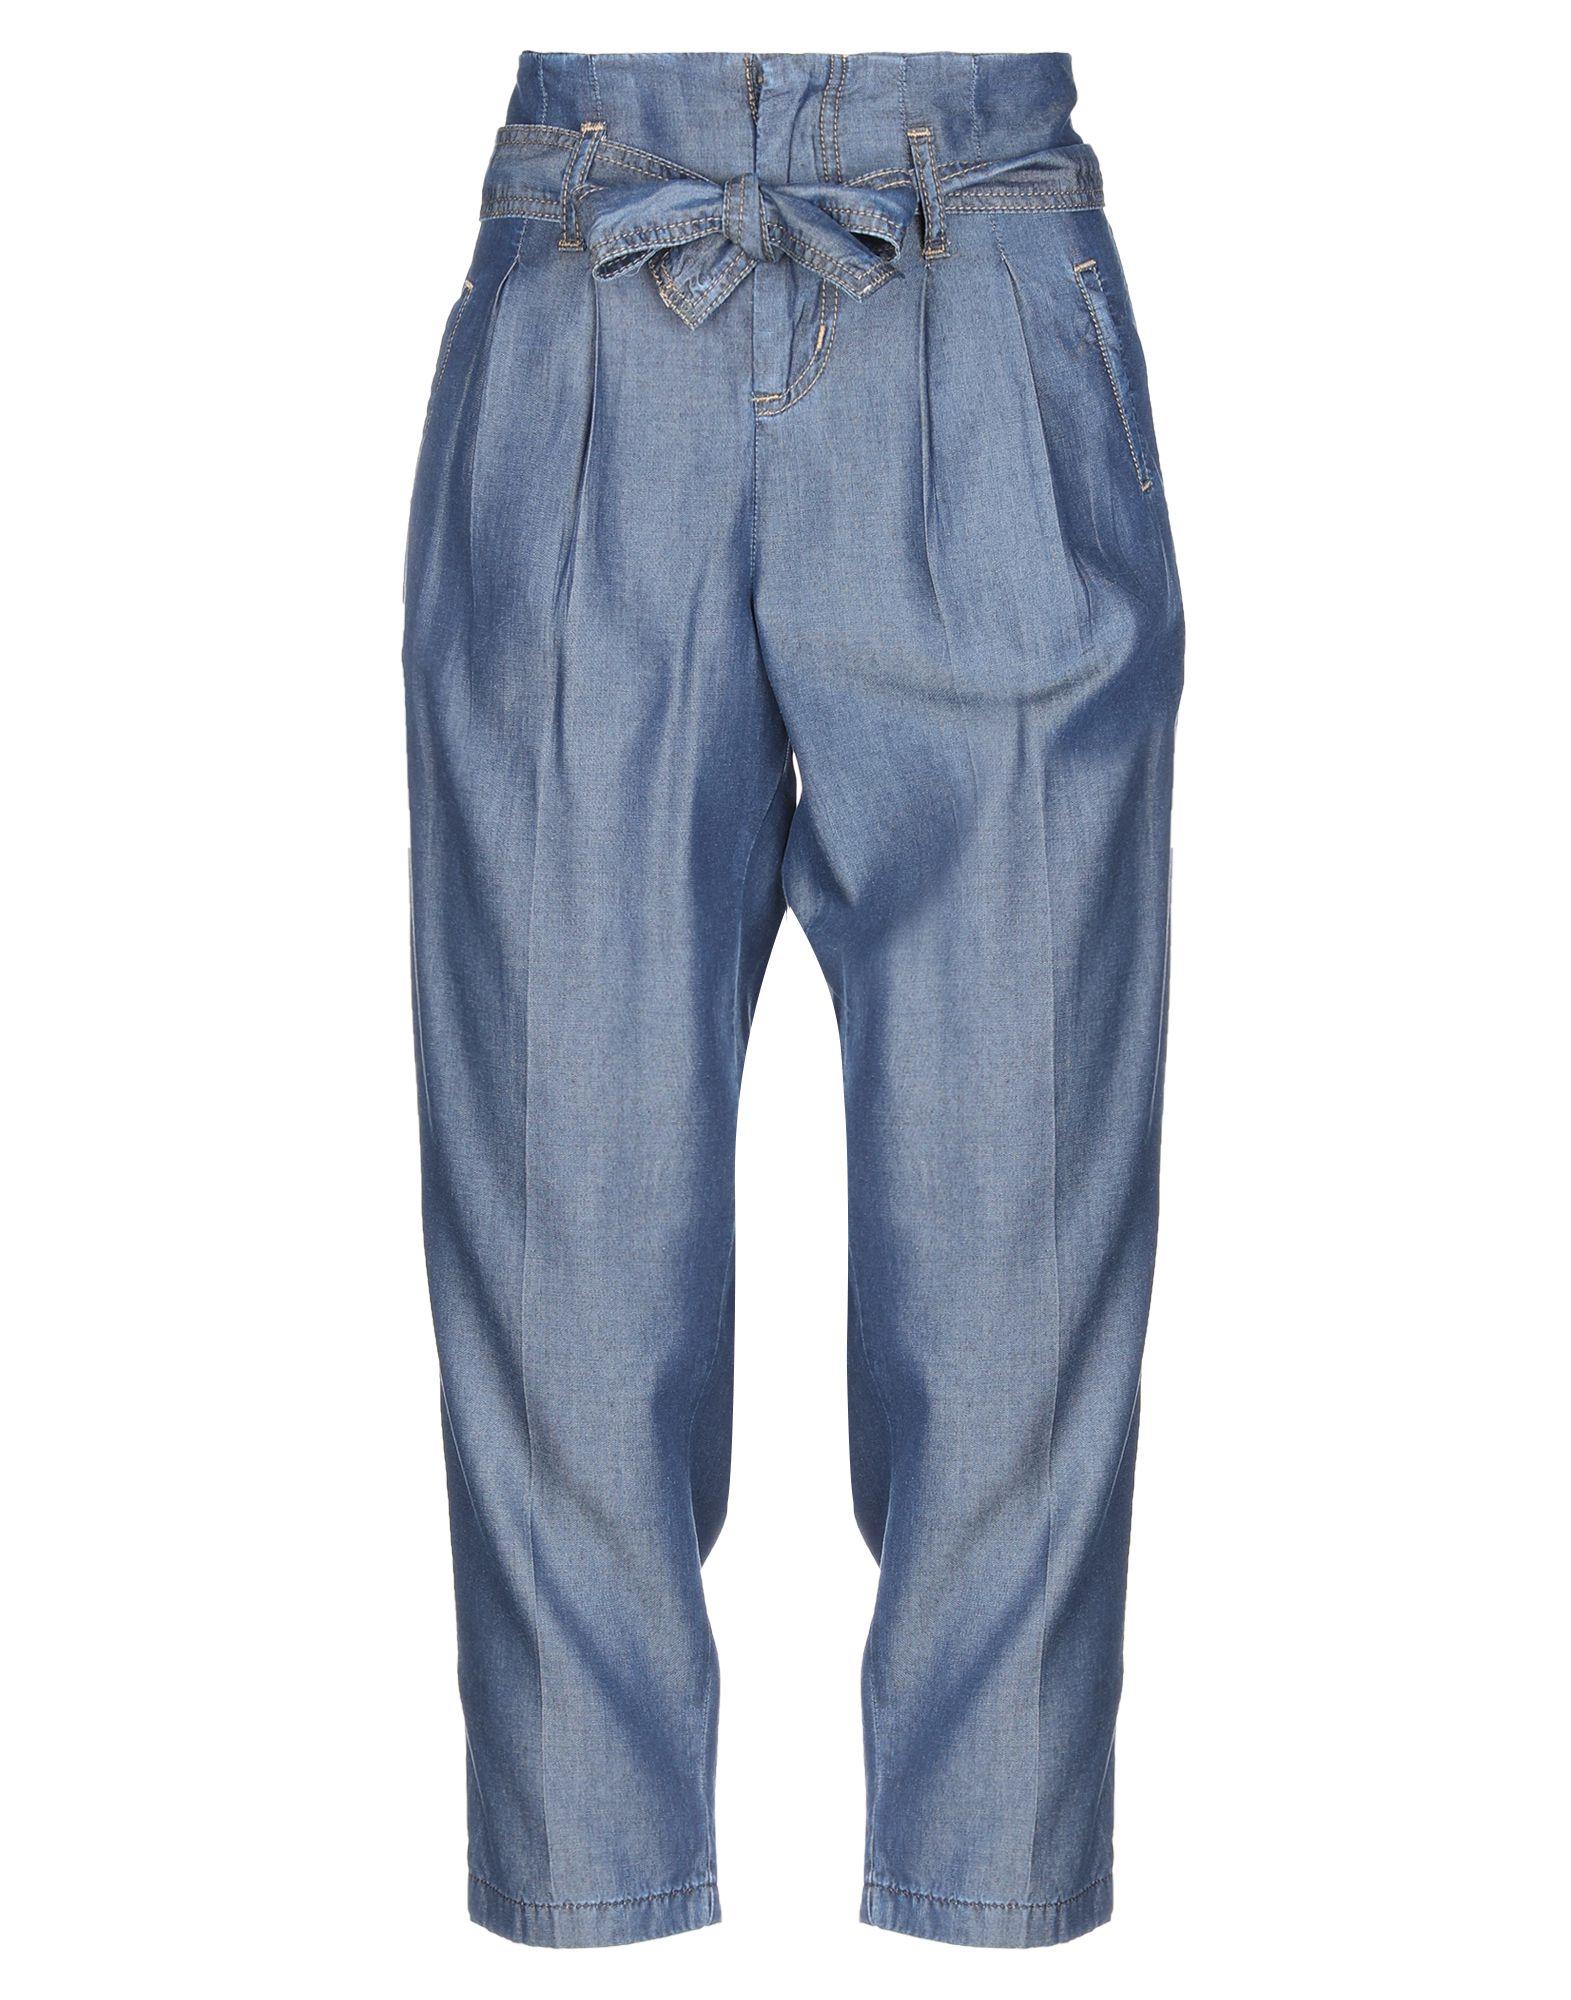 LIU •JO Джинсовые брюки-капри капри liu jo f67191t9564 a3814